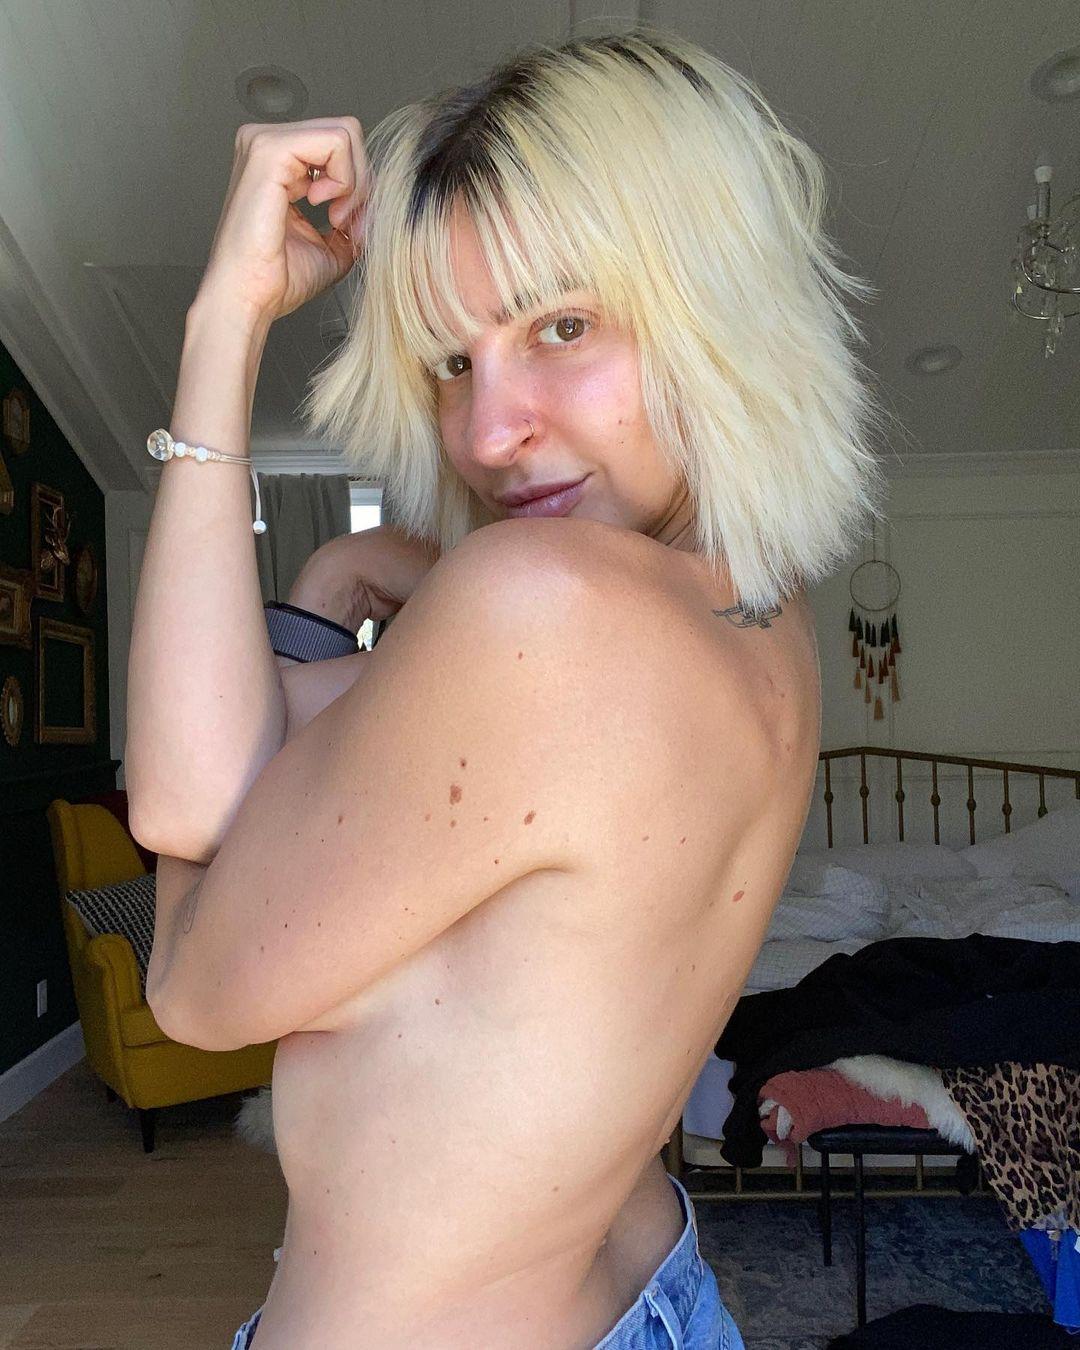 Gabbie Hanna Topless Handbra Leaked 0010